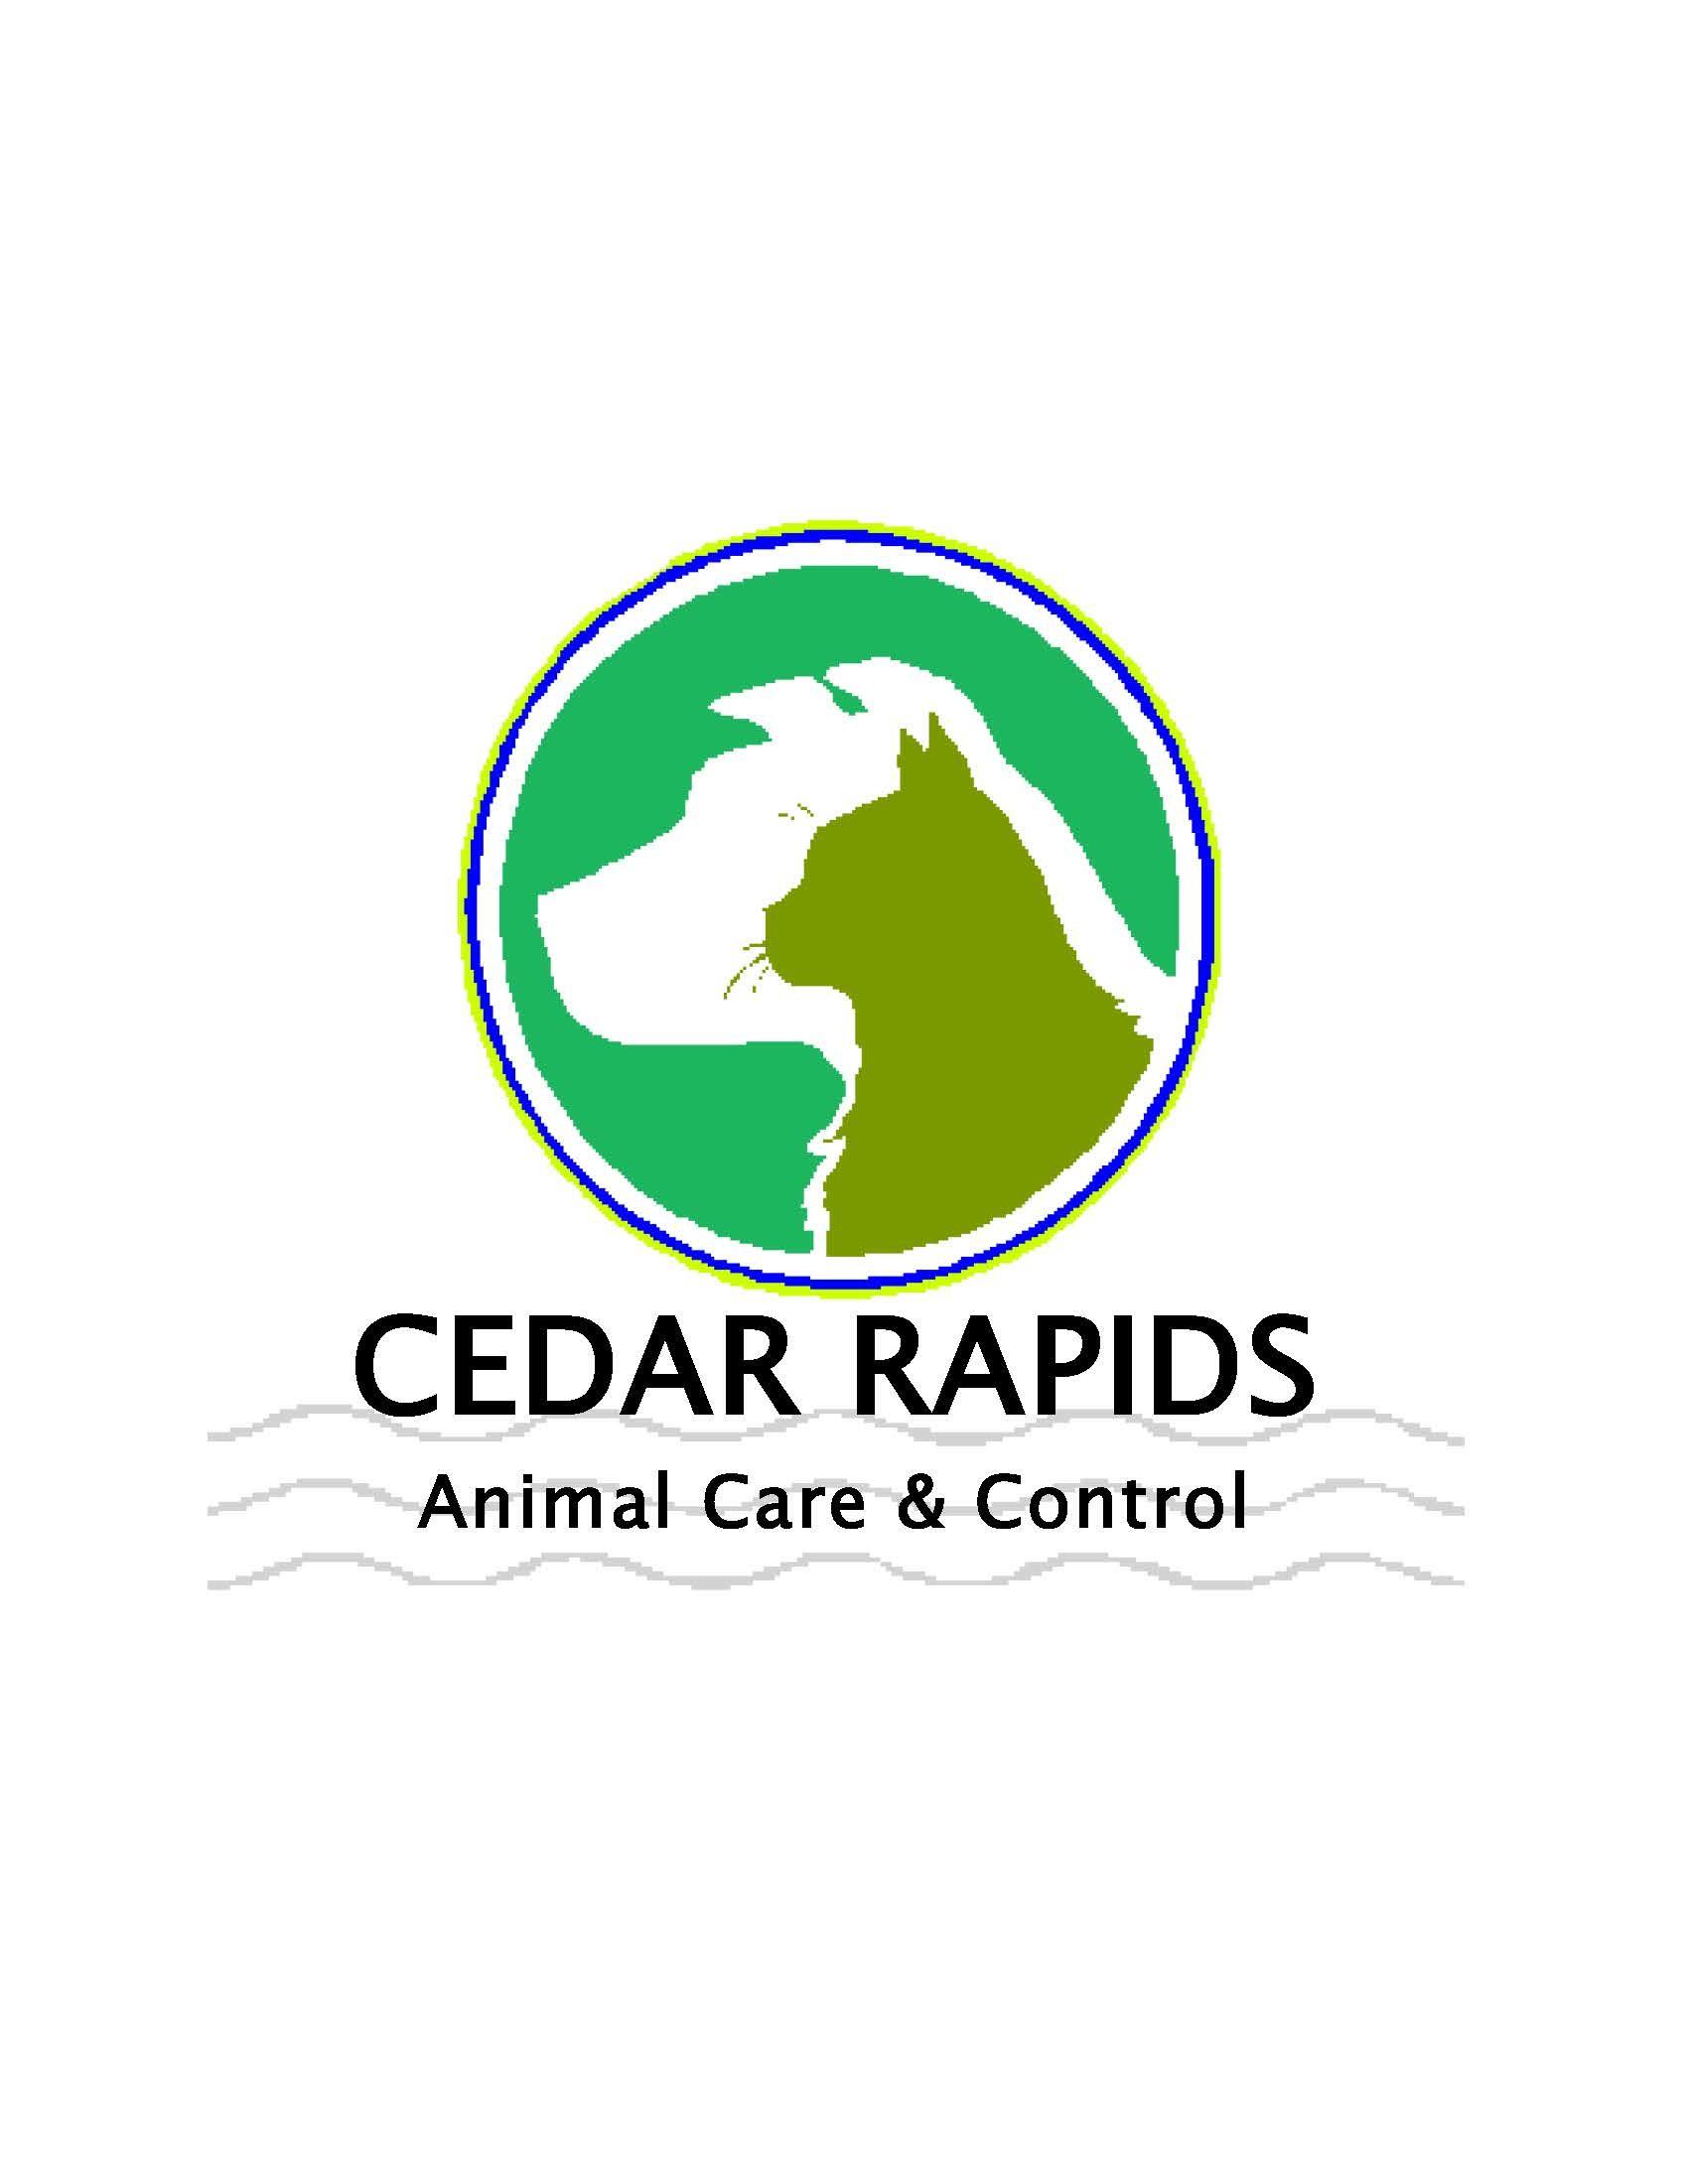 Pets for Adoption at Cedar Rapids Animal Care & Control (Animal